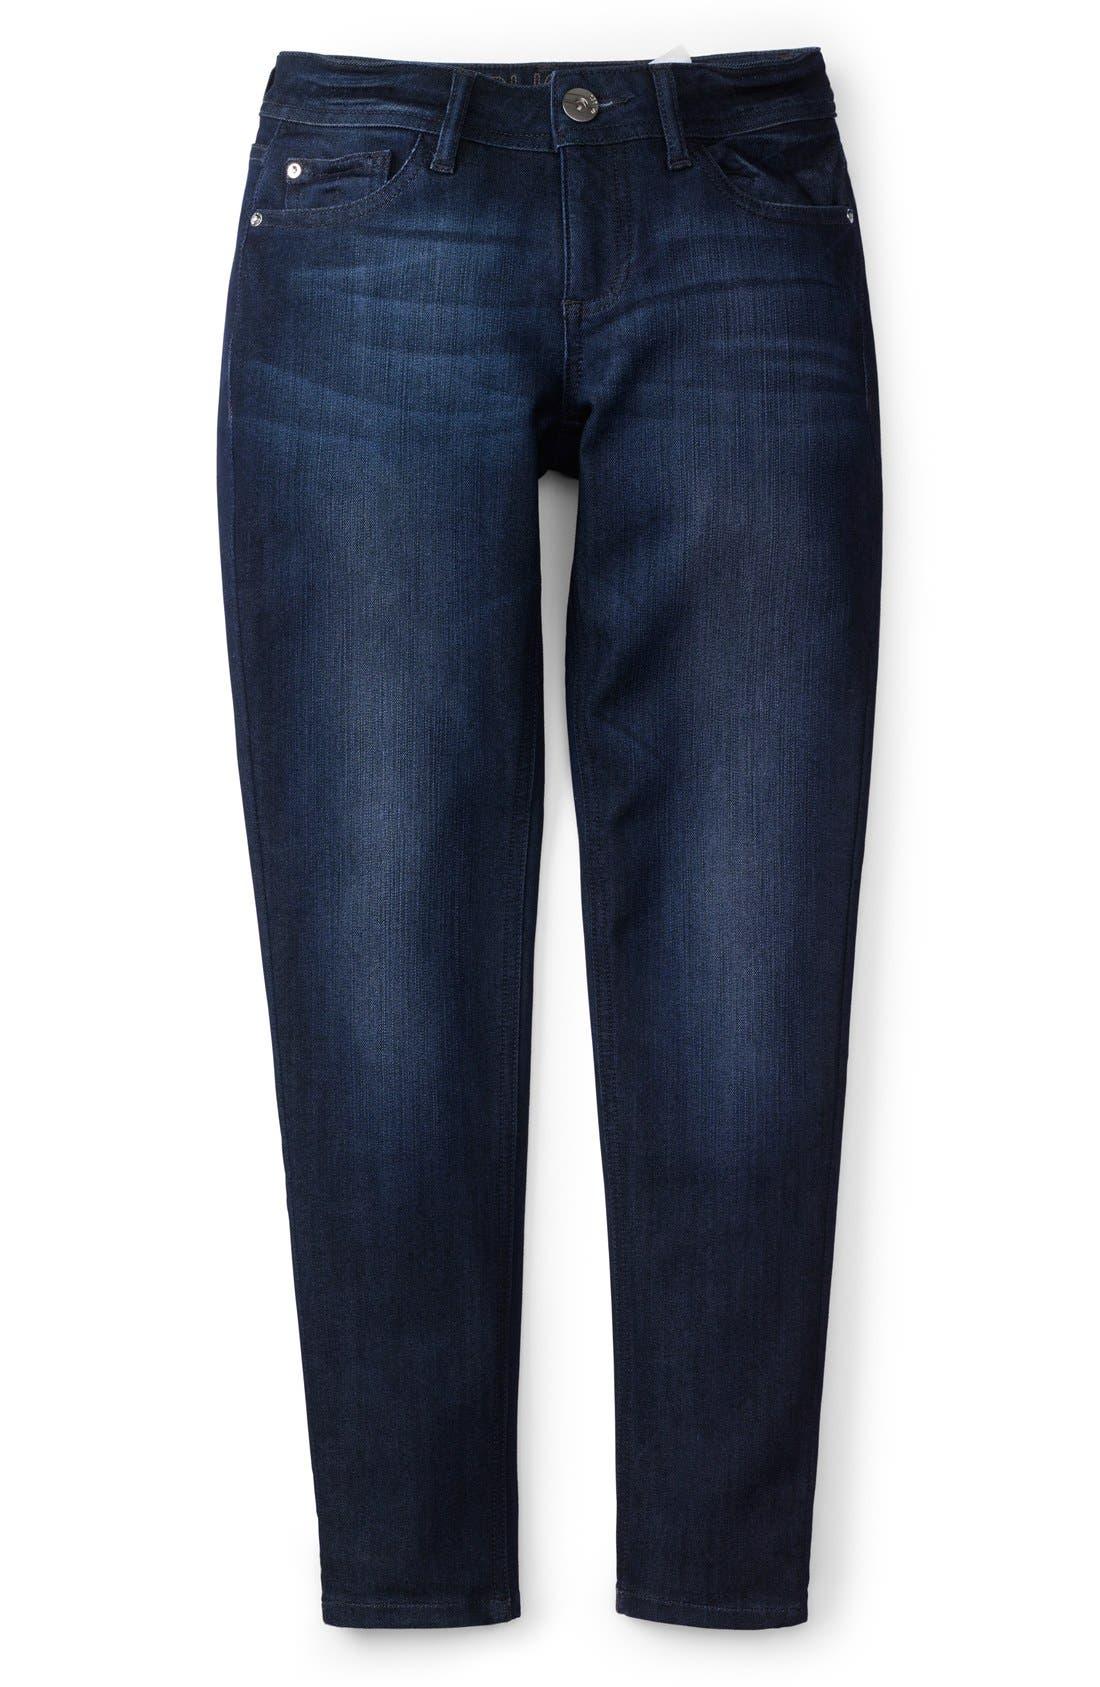 'Chloe' Skinny Jeans,                             Main thumbnail 1, color,                             LIMA